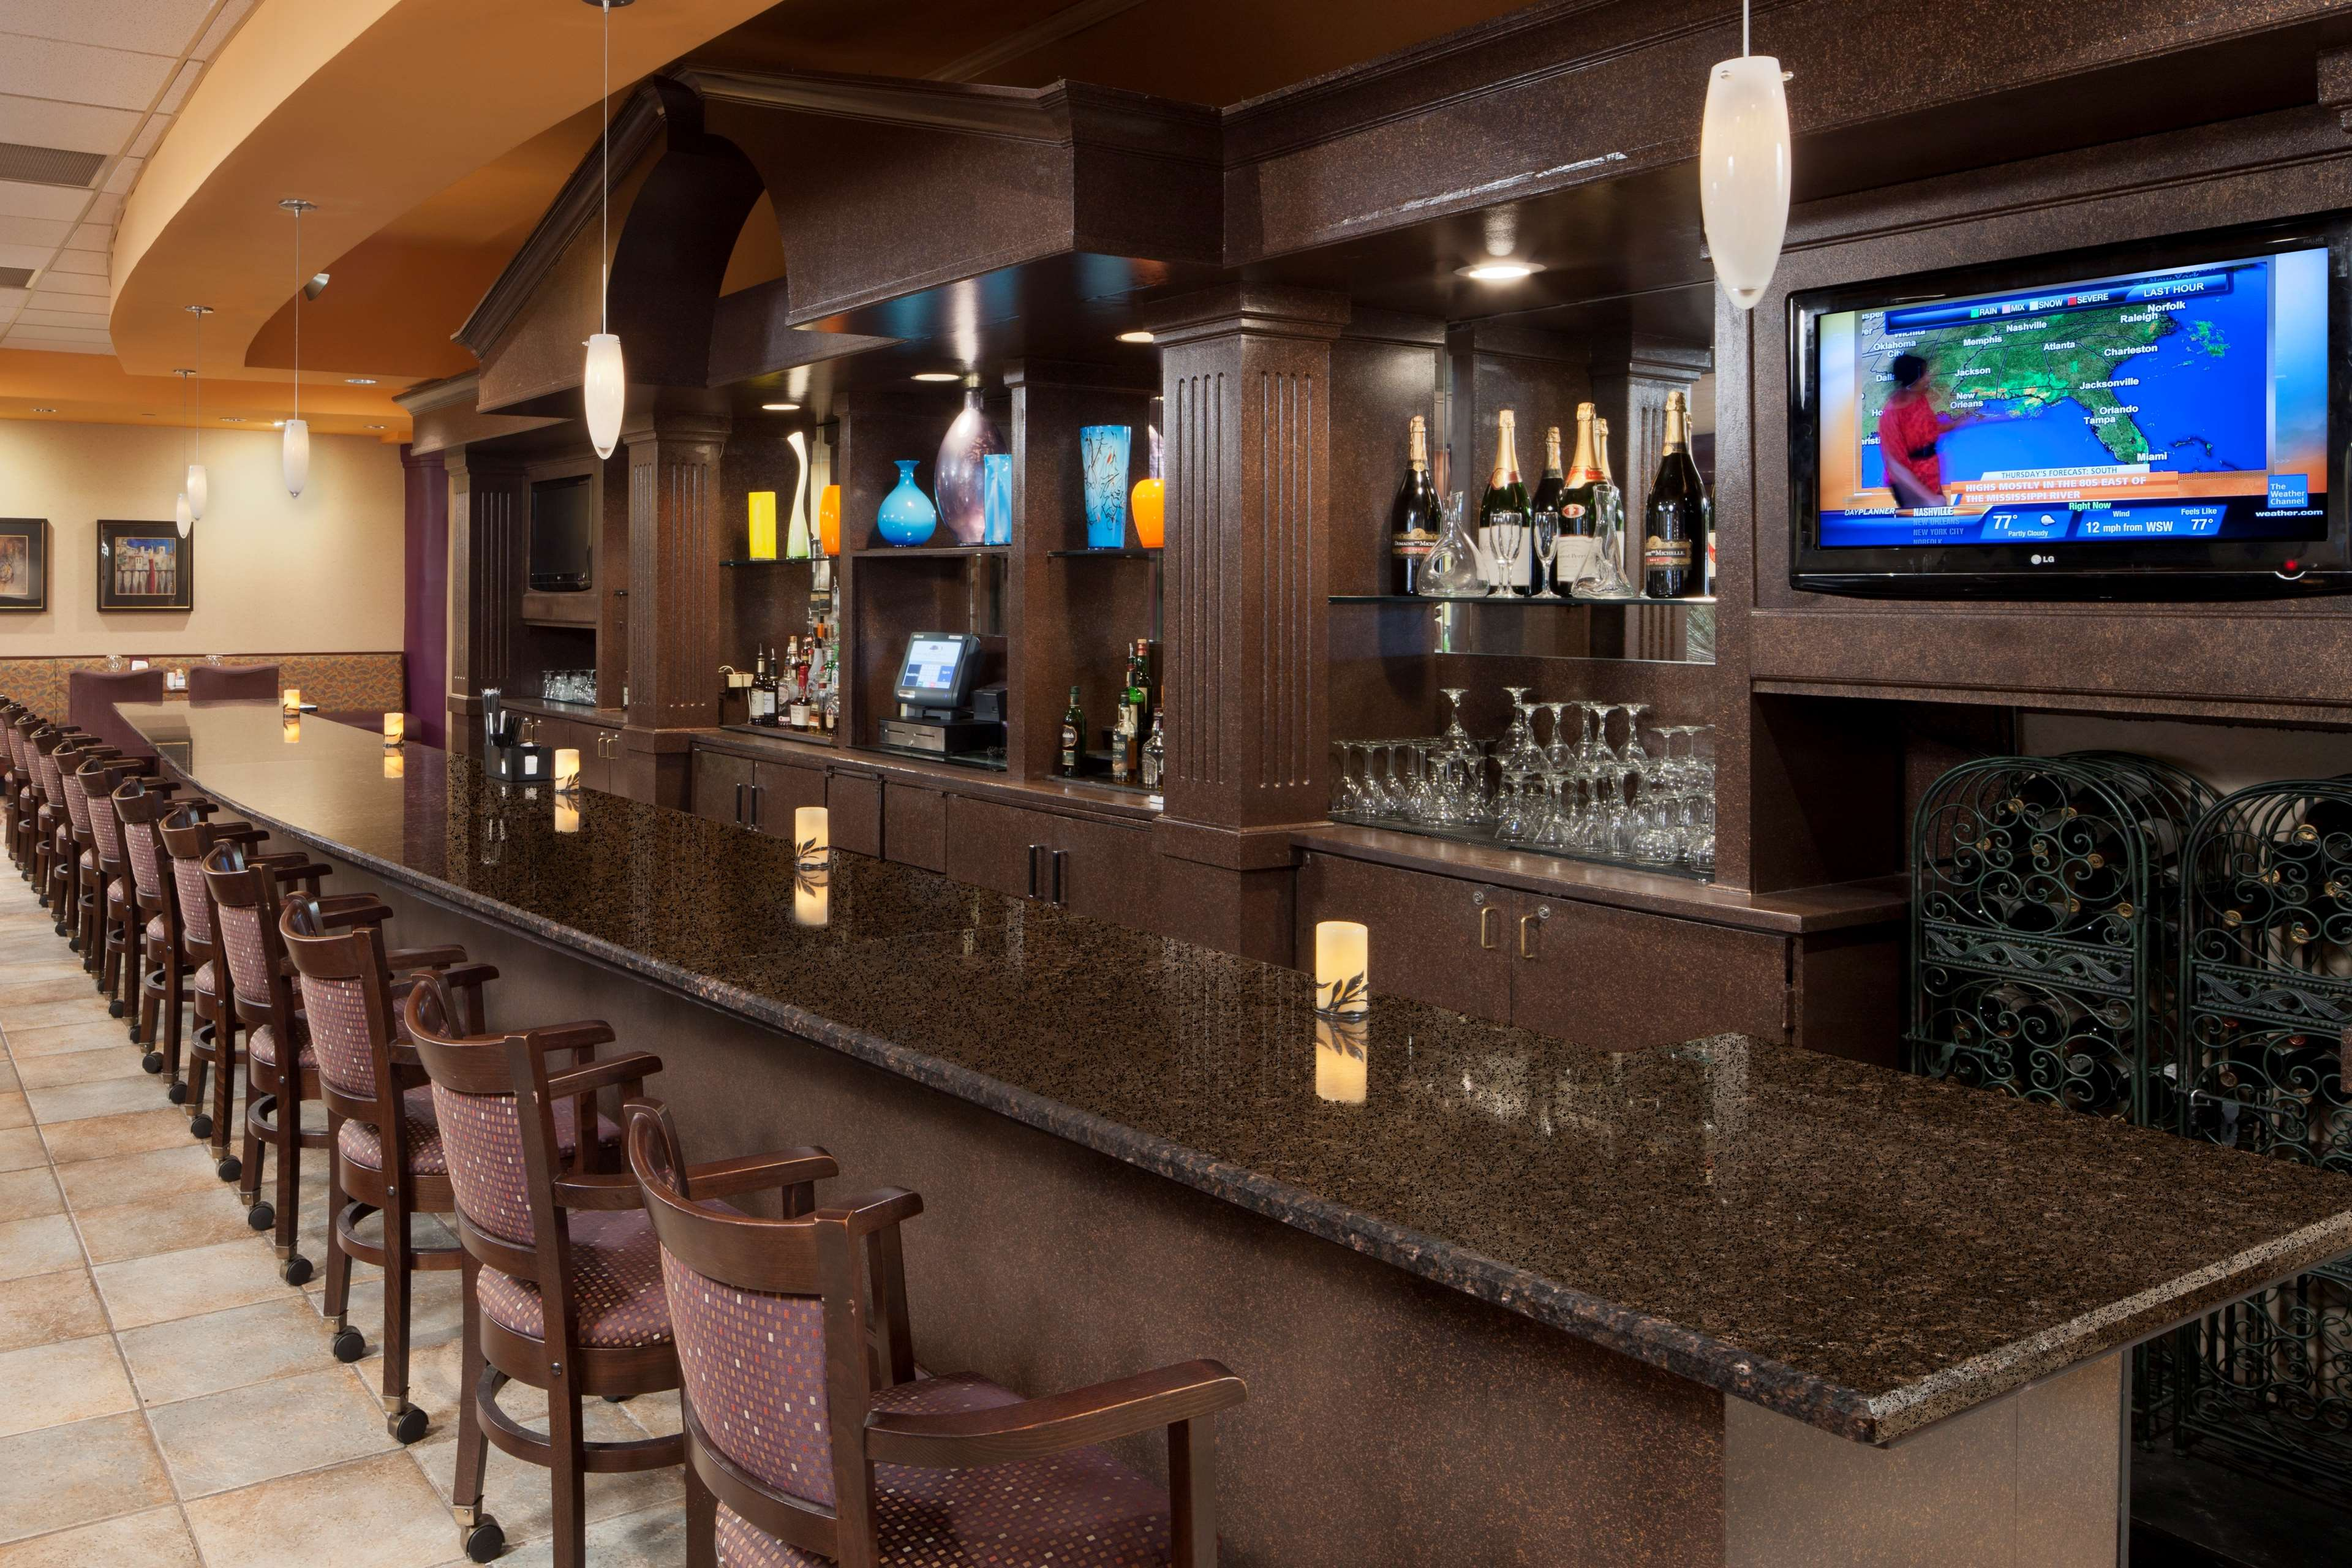 DoubleTree Suites by Hilton Hotel Cincinnati - Blue Ash image 34